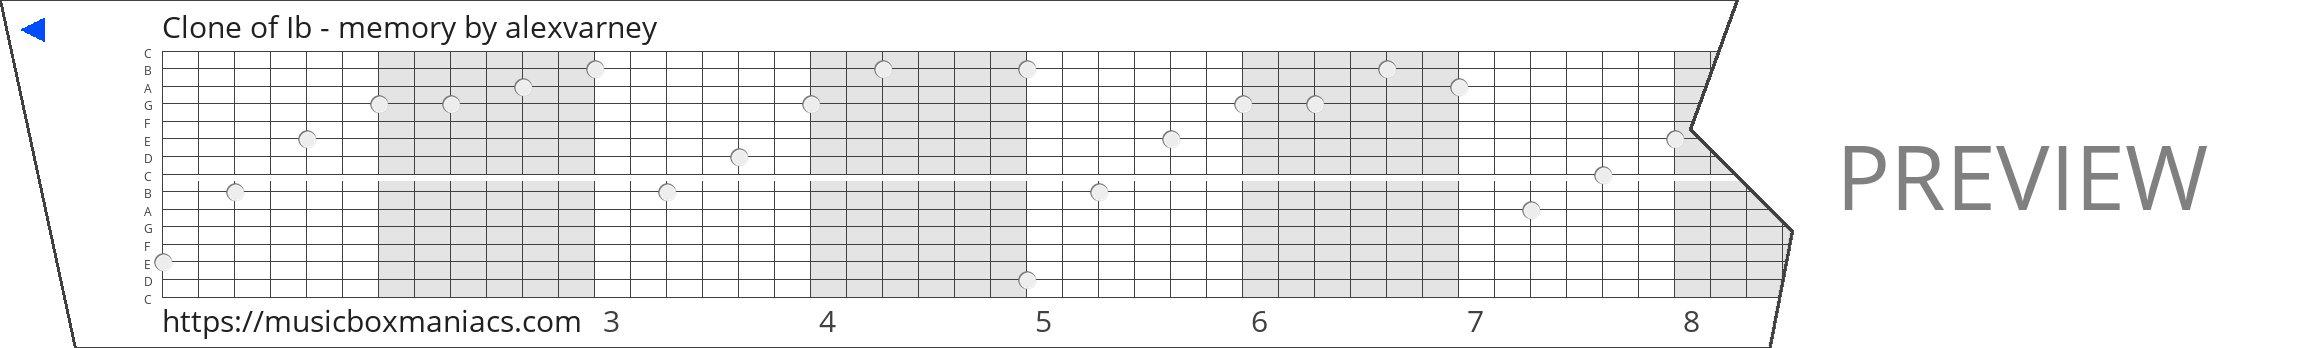 Clone of Ib - memory 15 note music box paper strip